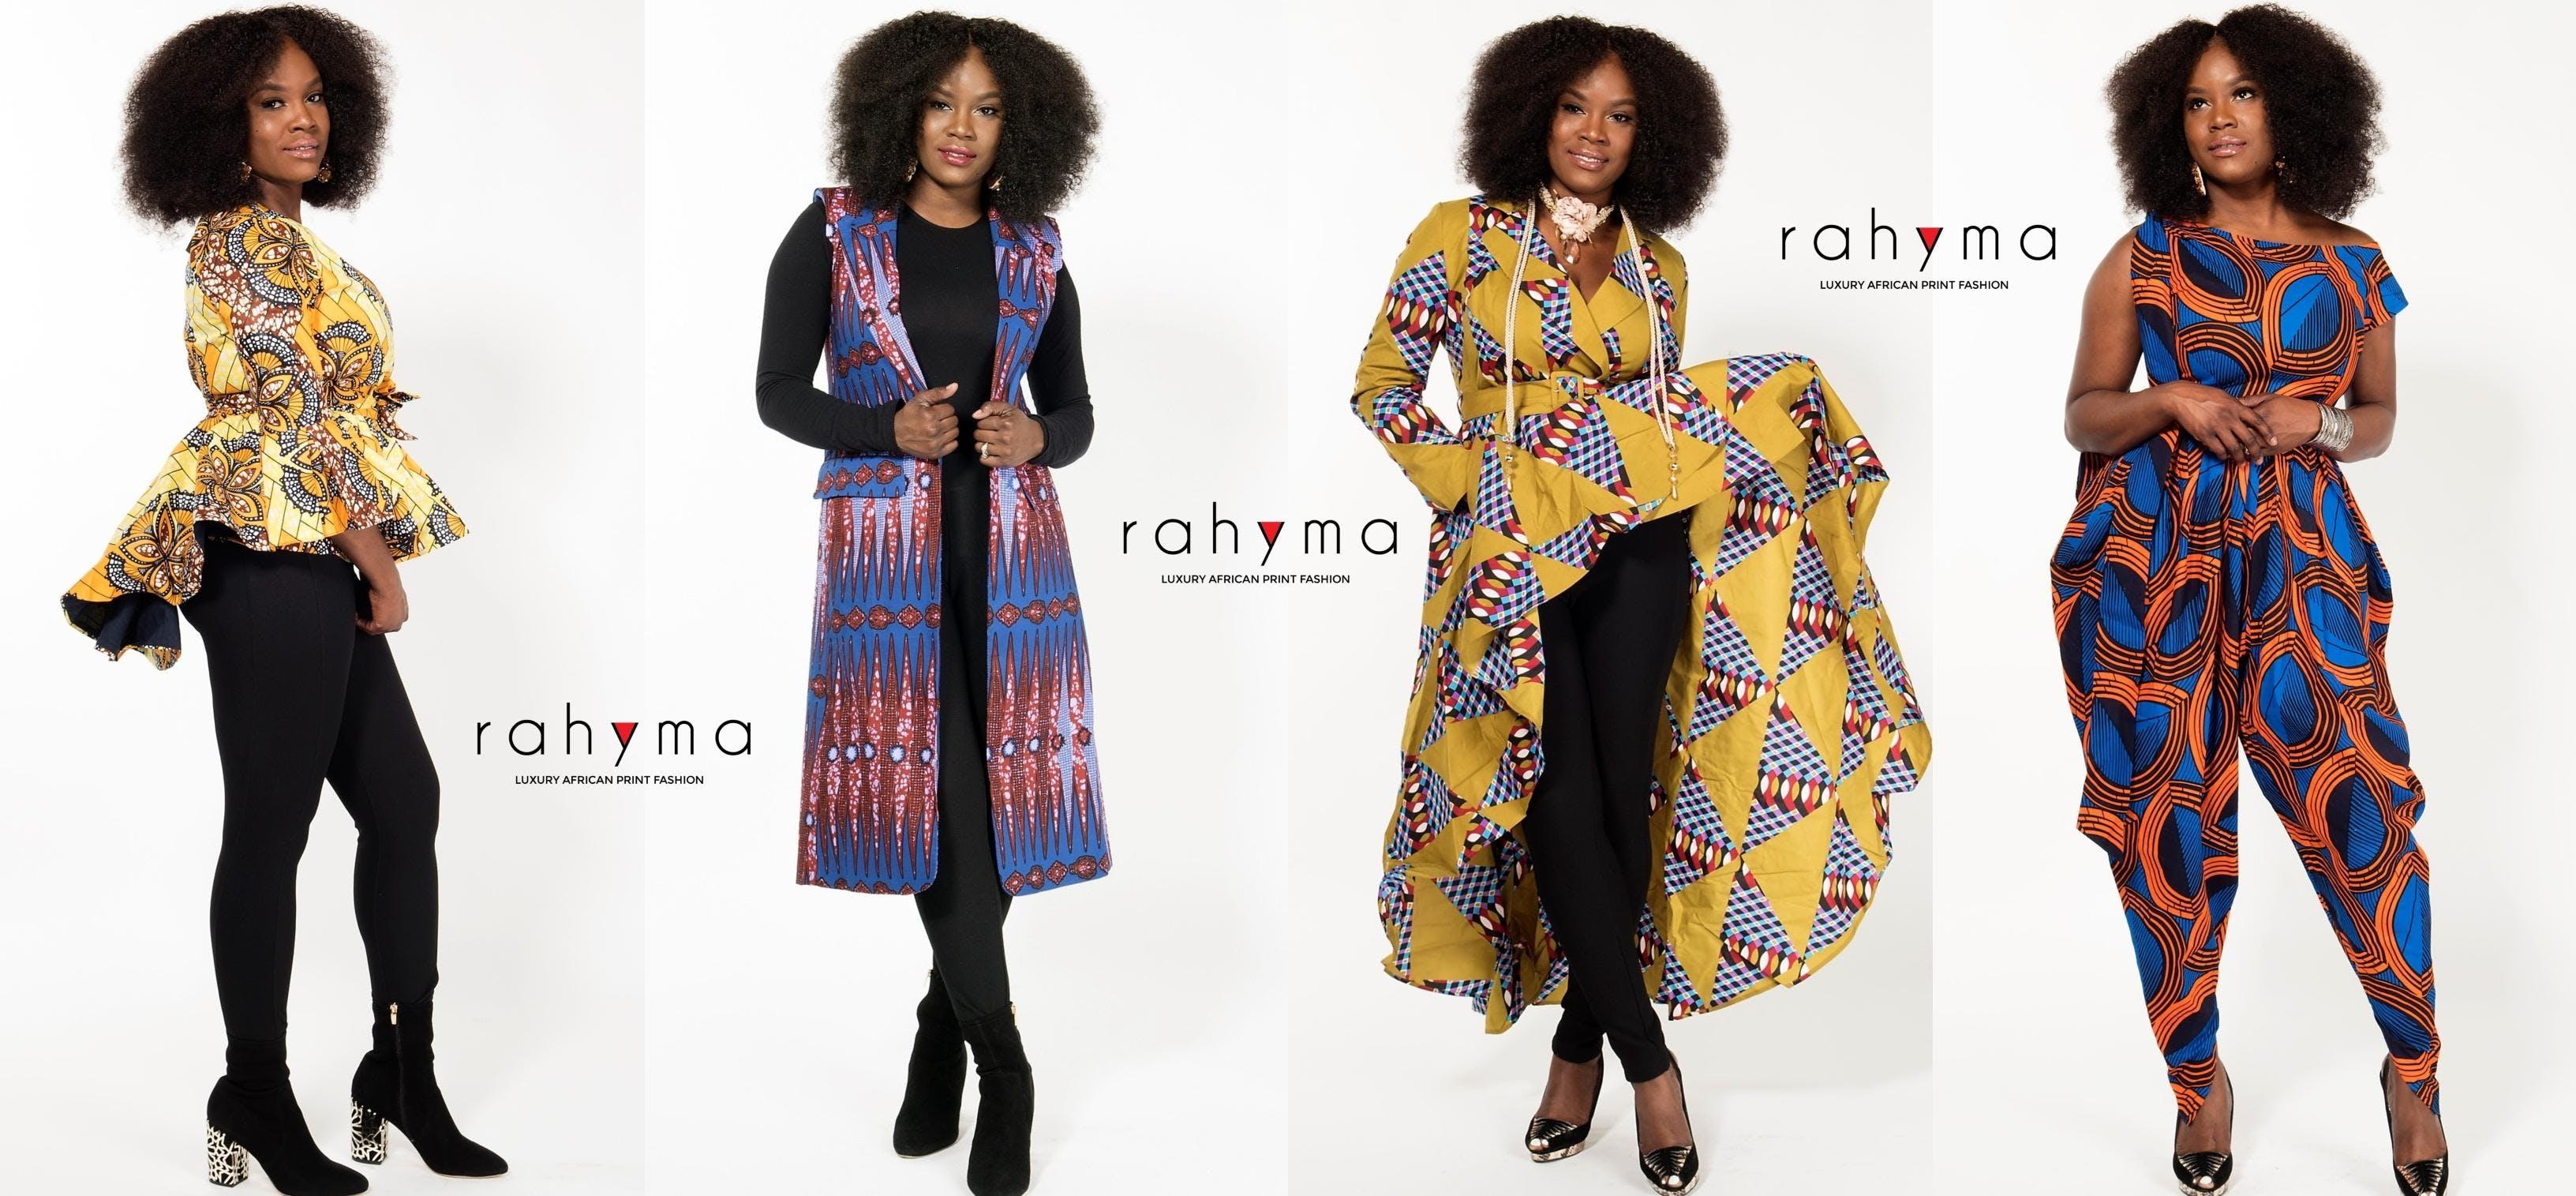 RAHYMA BLACK HISTORY POP-UP SHOP PHILLY